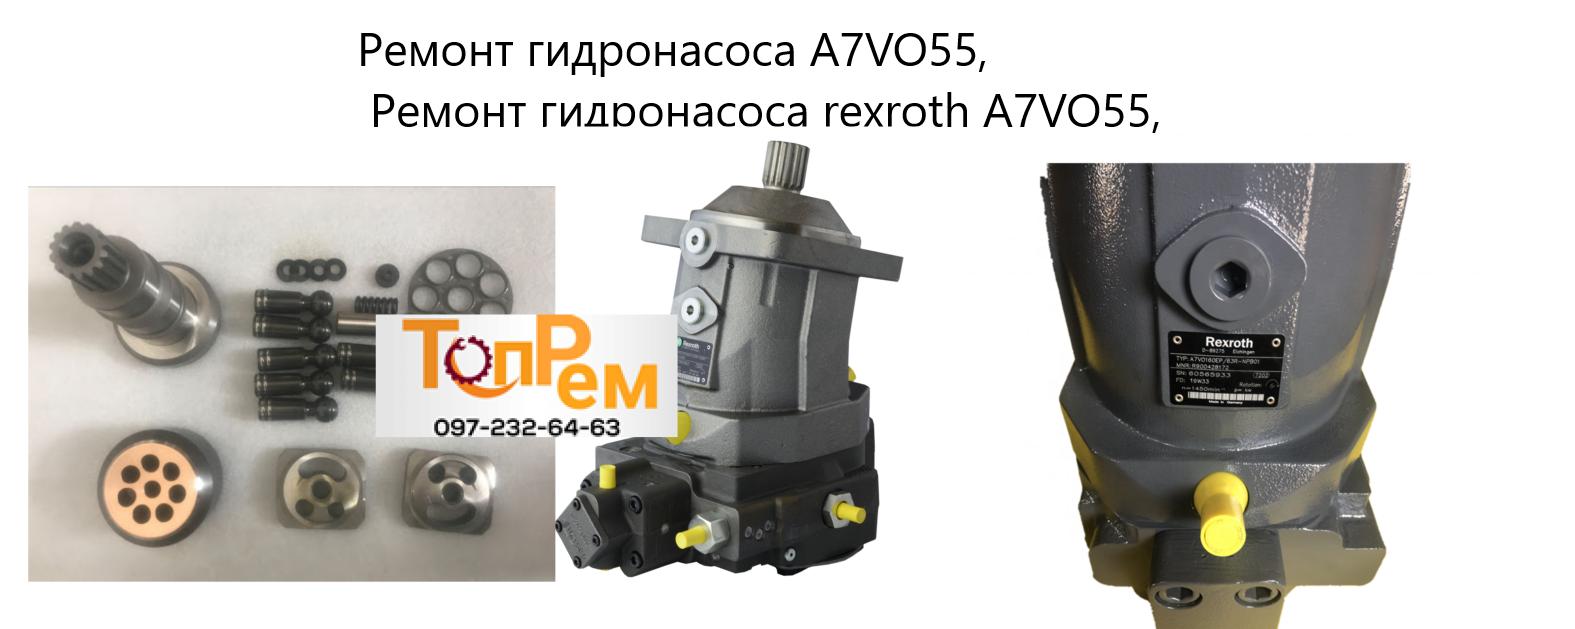 Ремонт гидронасоса A7VO55